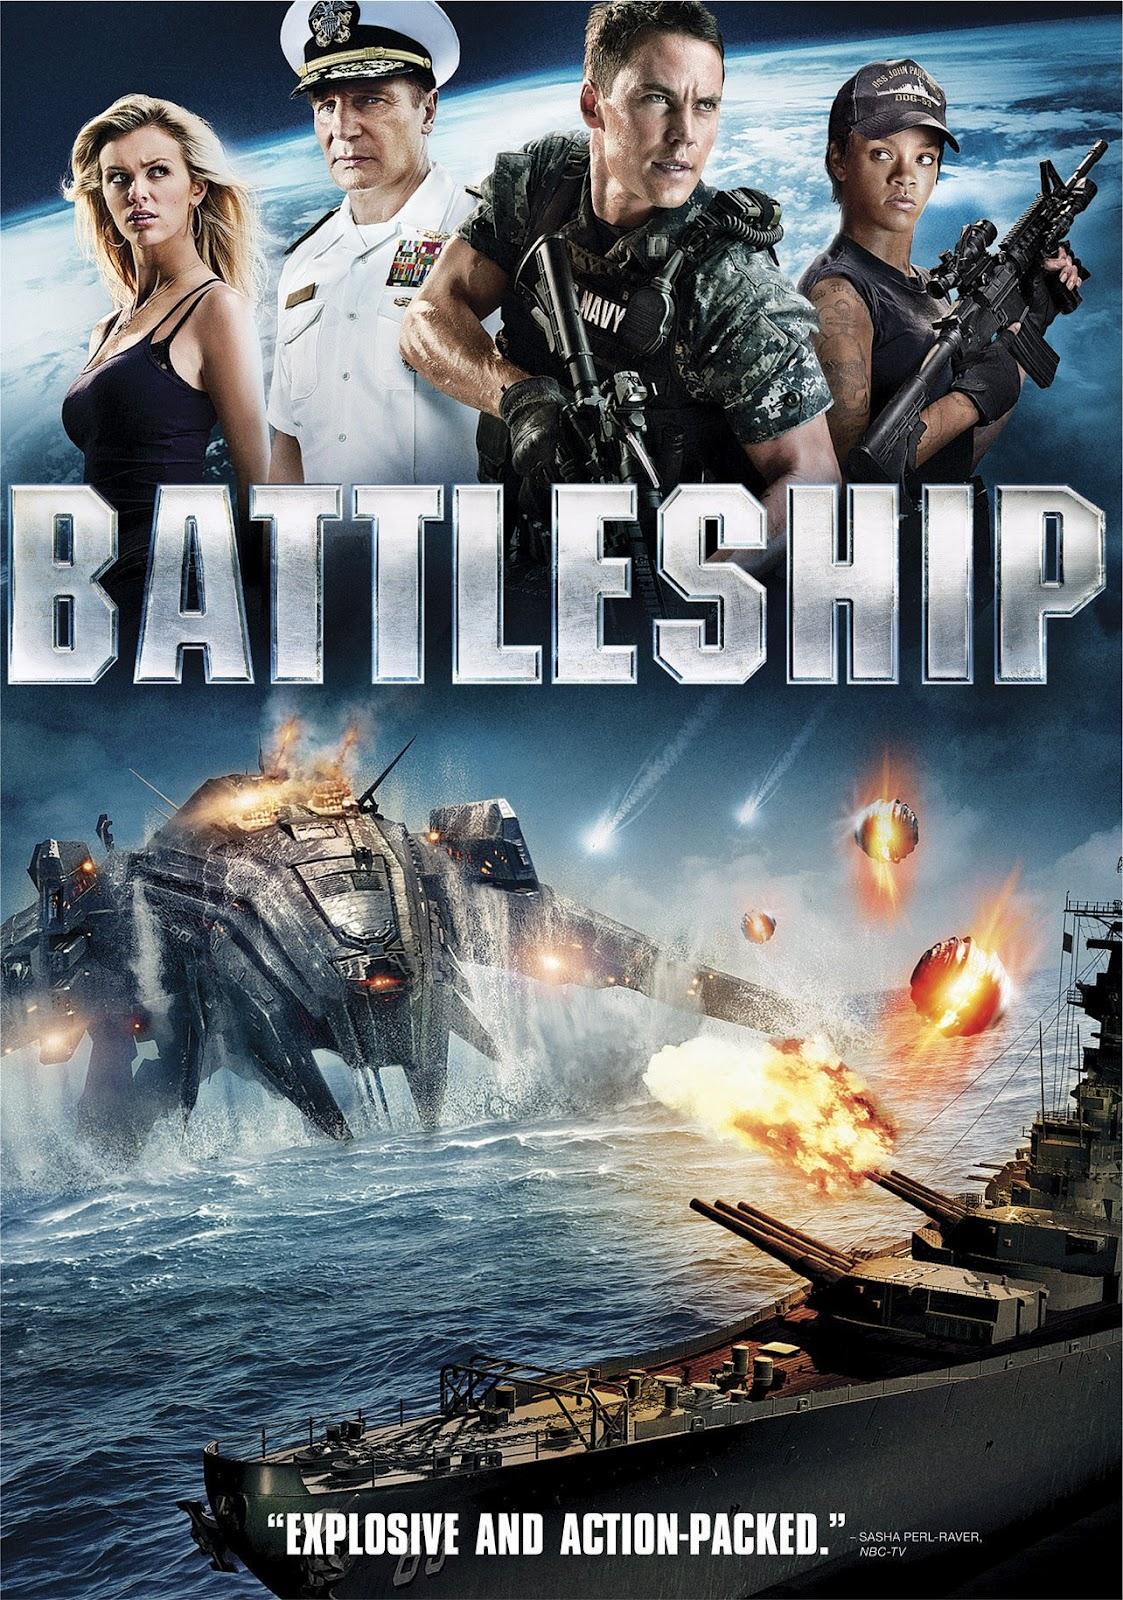 descargar batalla naval dvdrip latino 1 link